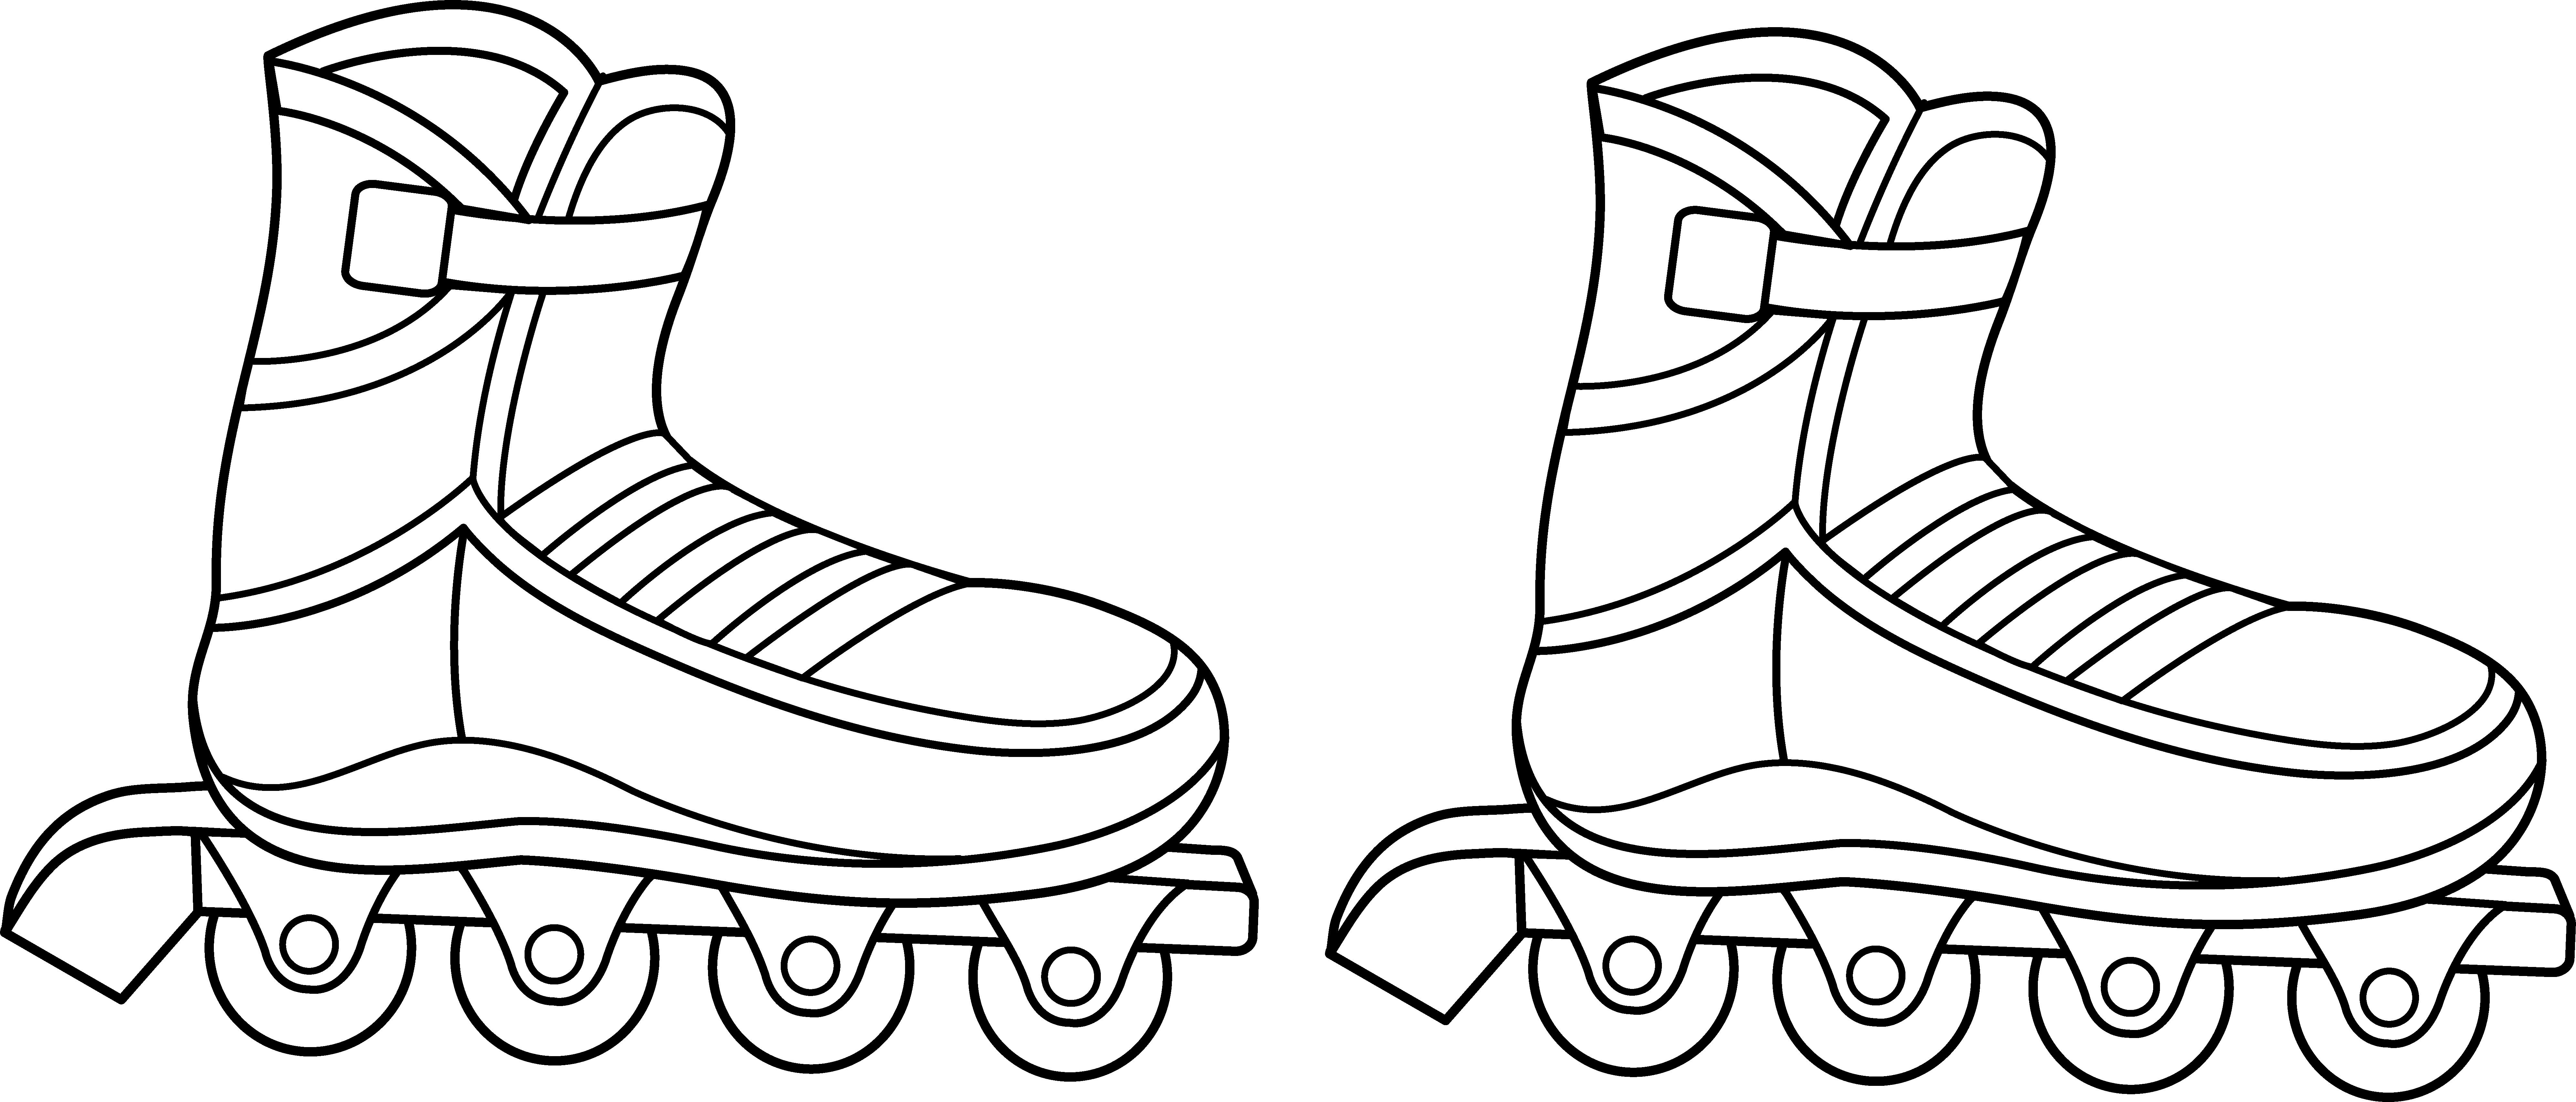 Rollerblade Images.